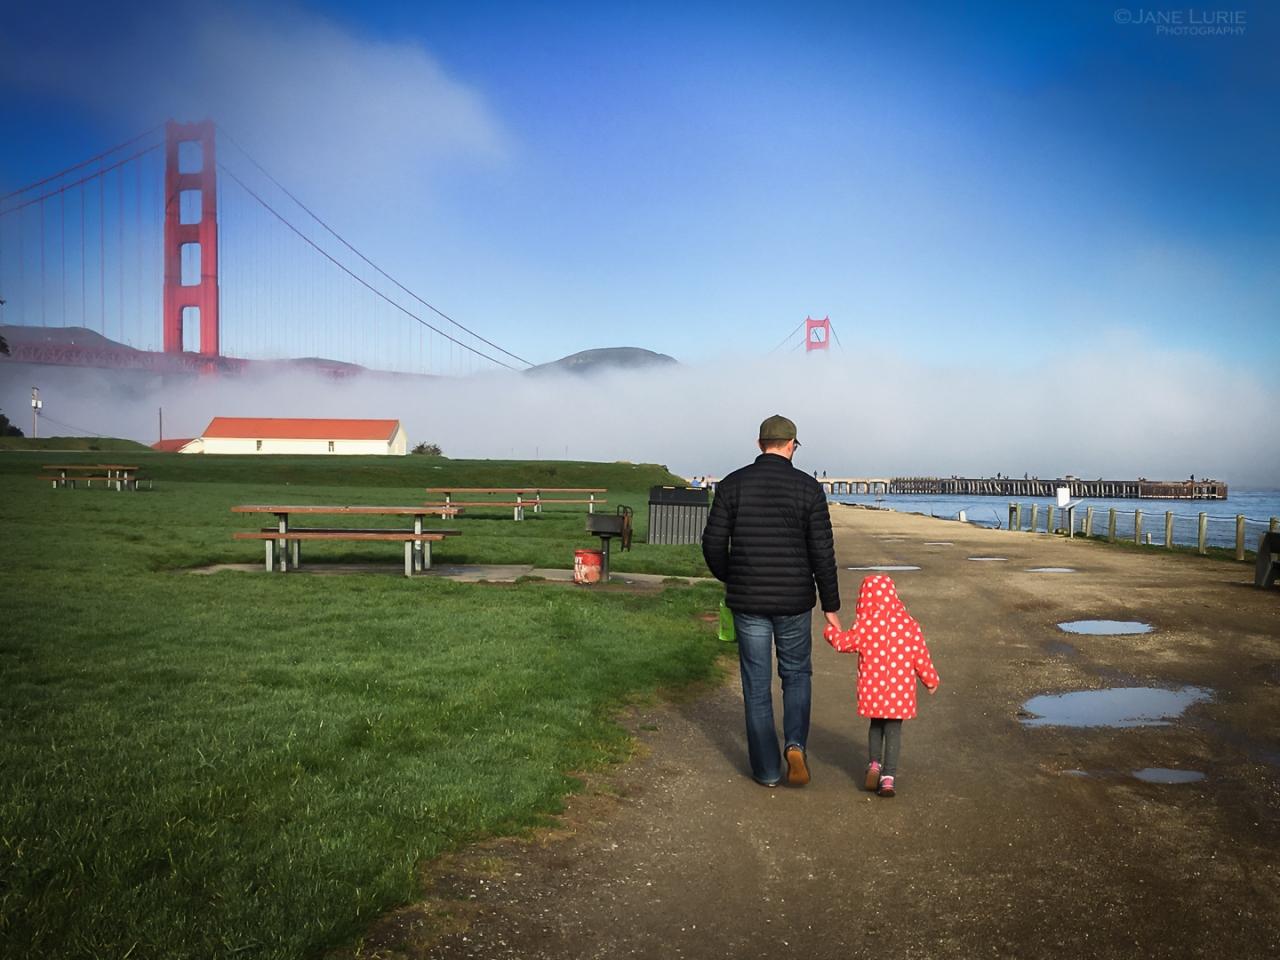 Portrait, Rain, San Francisco, Photography